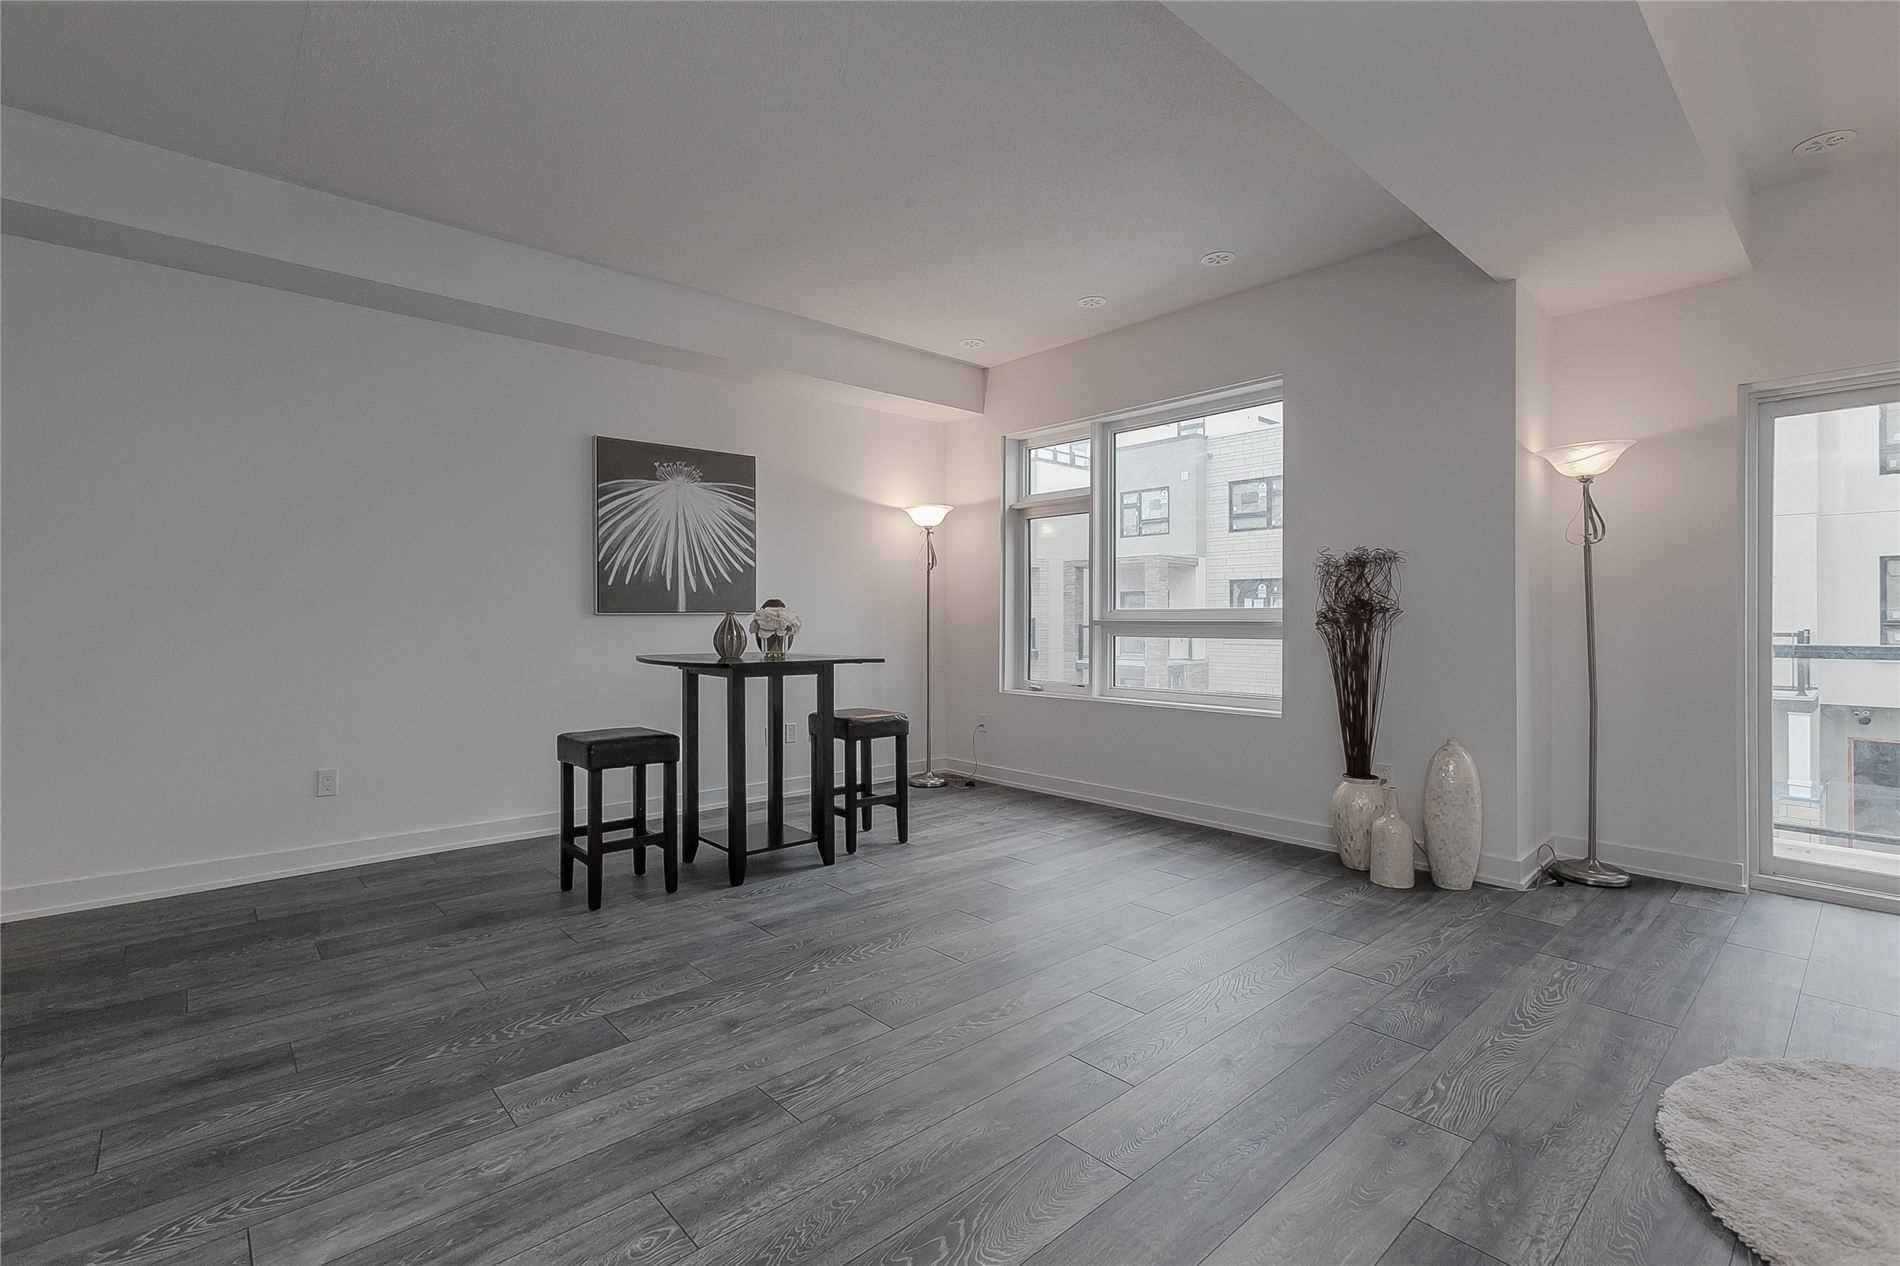 1121 Cooke Blvd, Burlington, L7T0C3, 2 Bedrooms Bedrooms, ,3 BathroomsBathrooms,Condo Townhouse,For Sale,Cooke,W5085770